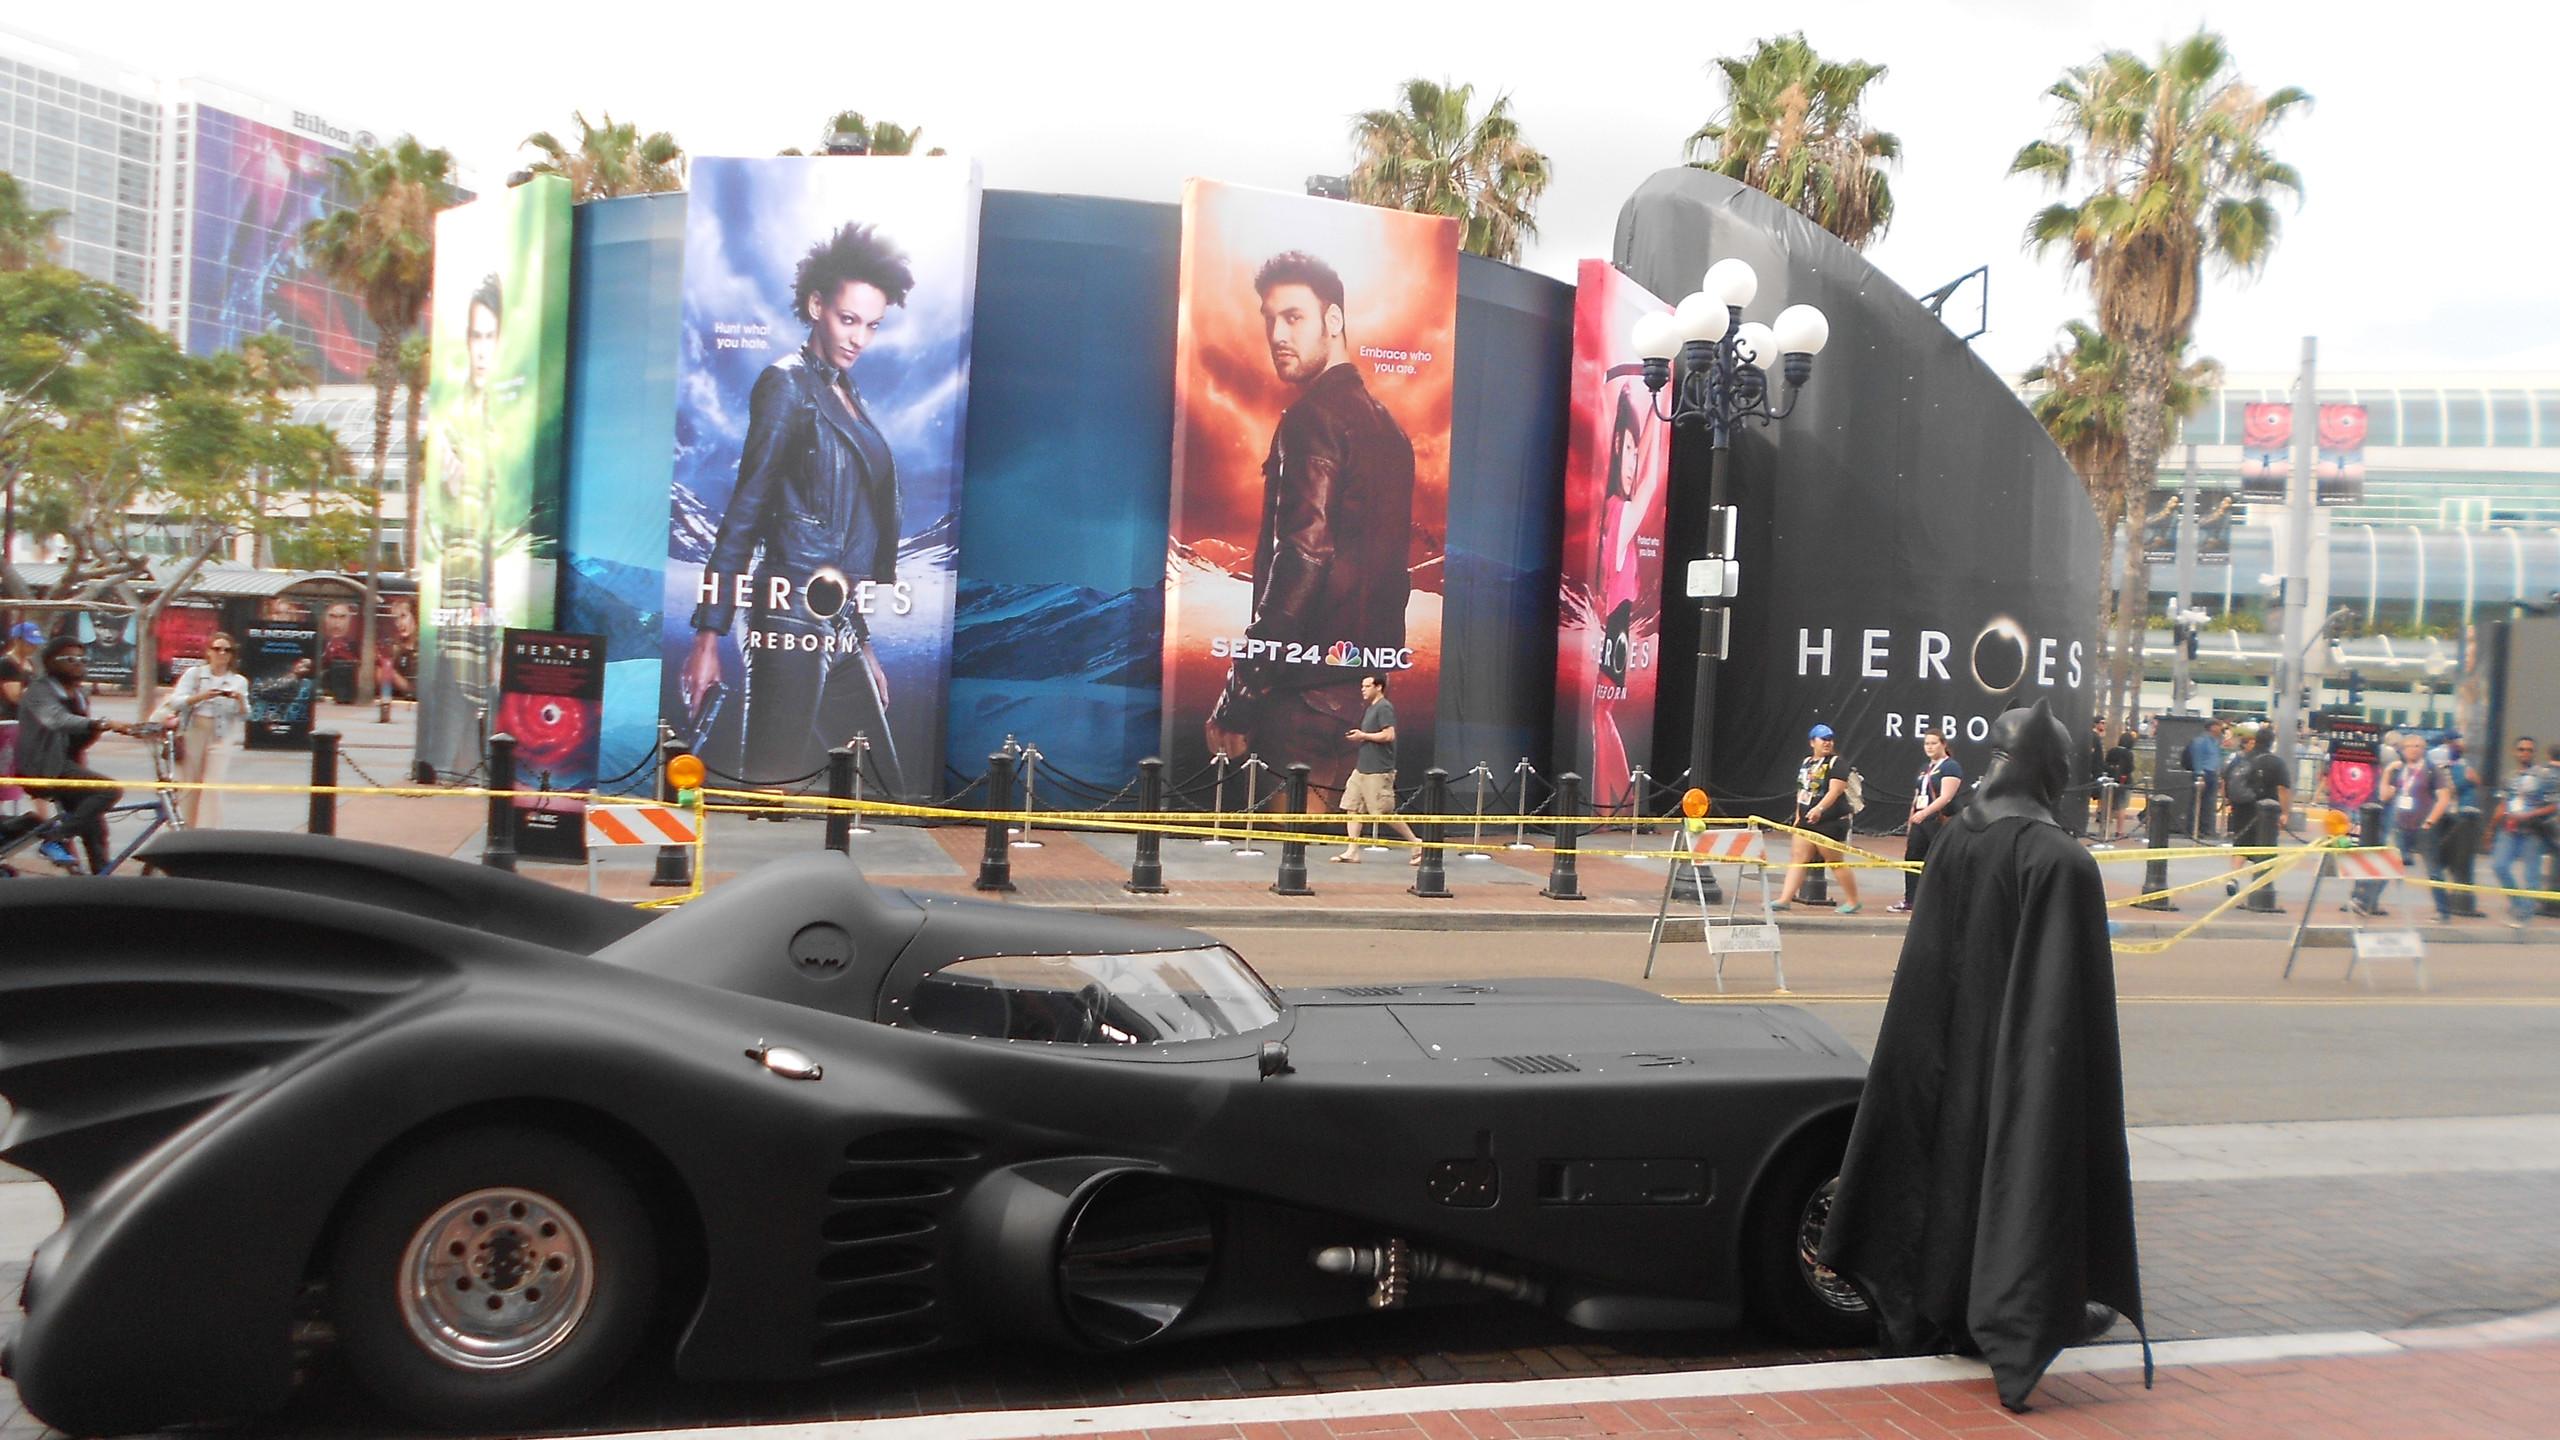 SDCC, comic-con, convention, San Diego, Batman, Batmobile